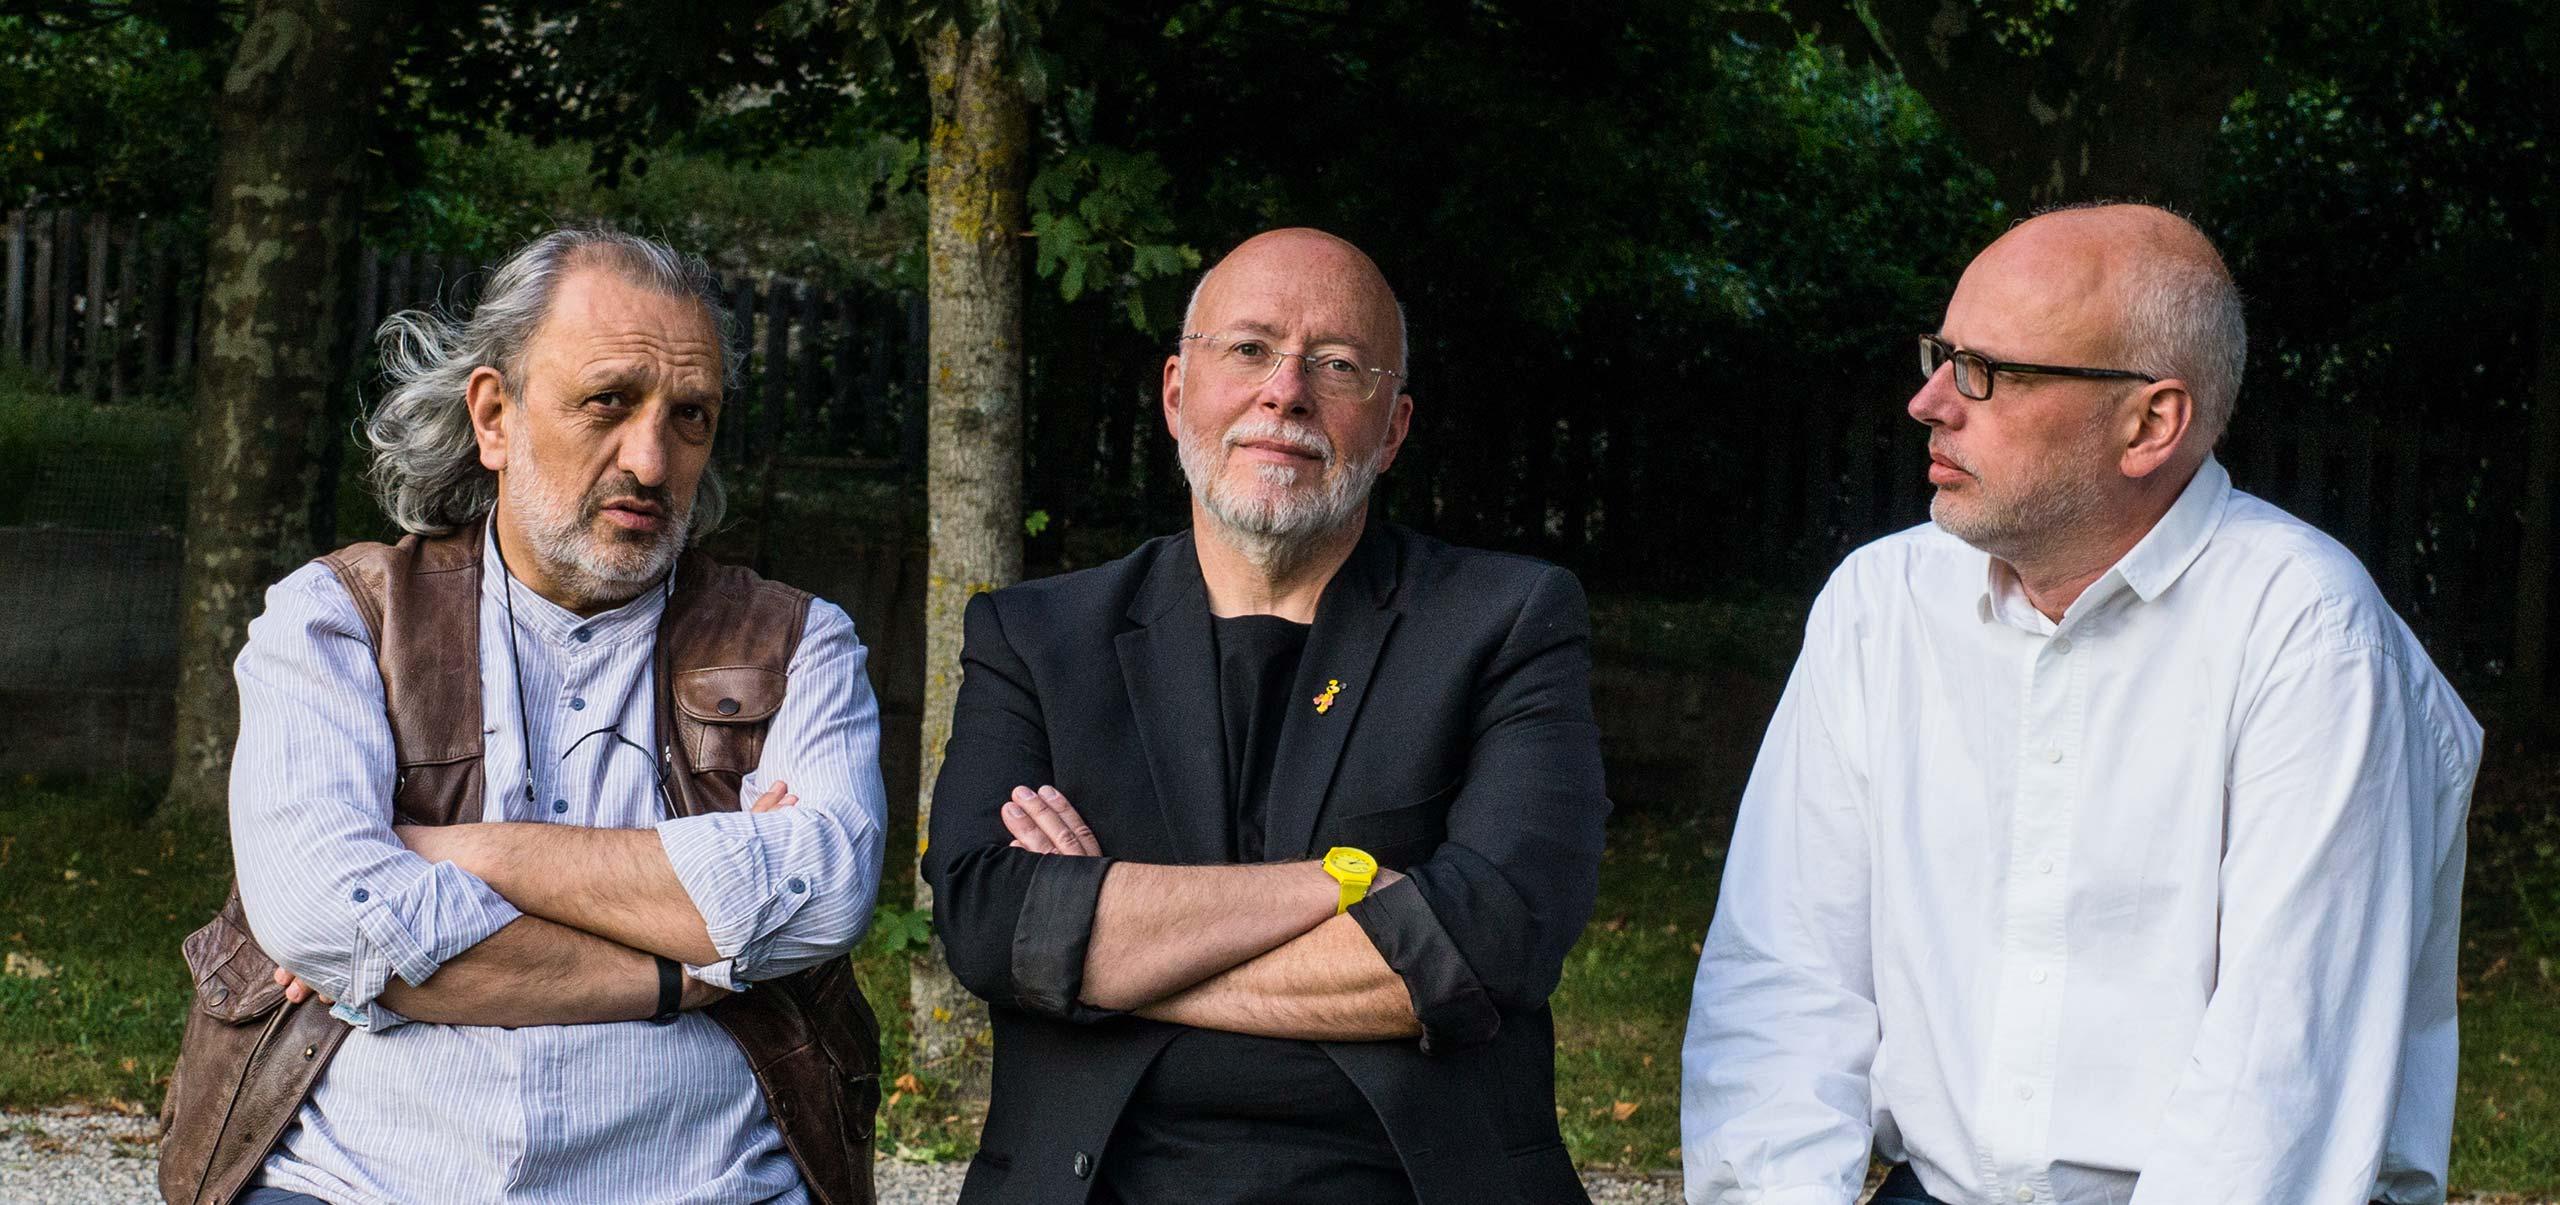 trio27 in Recoubeau, Le Couvent